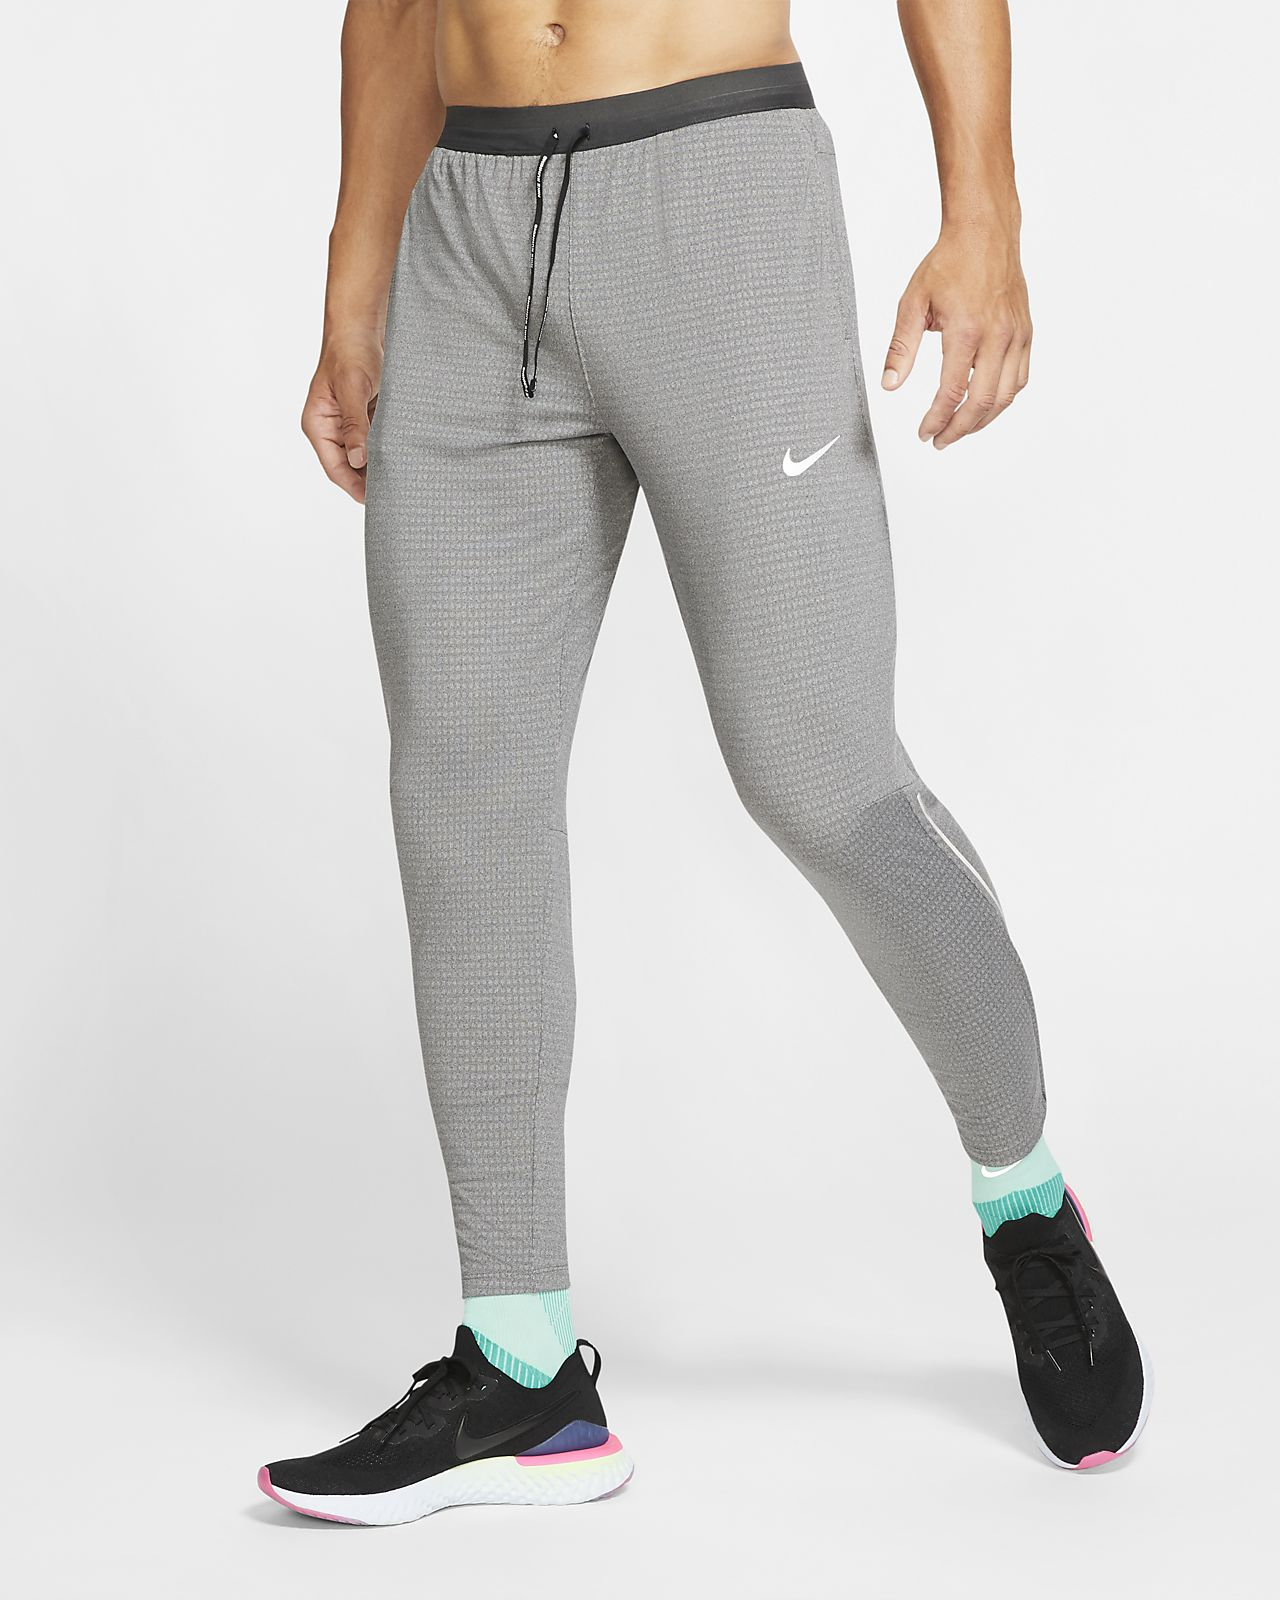 Nike Phenom Pantalón de running de tejido Knit - Hombre